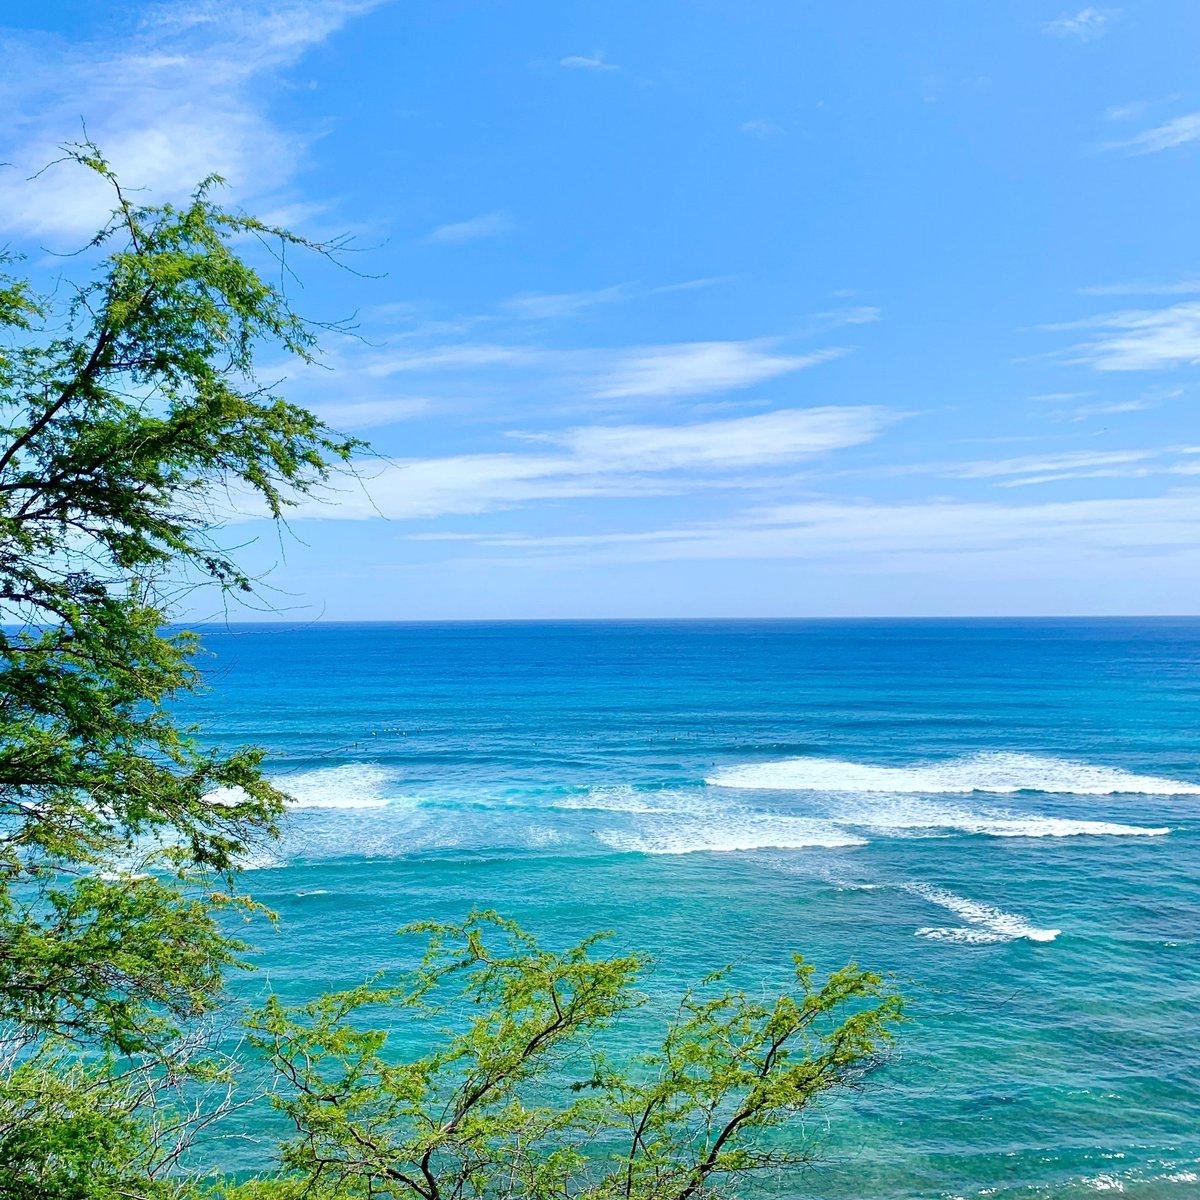 Ocean Blue💙💙💙  #summer #oceanblue #diamondheadbeach #hawaiilife #hawaii #hilife #lovehawaii #surf #surfing #surflife #beachlife #beachday #beachlover #beachgirl #aloha #luckywelivehawaii #ハワイの海 #サーフィン #ハワイ #ビーチライフ #ハワイライフ #ハワイ暮らし #海のある生活 https://t.co/F7n3vKiKV2